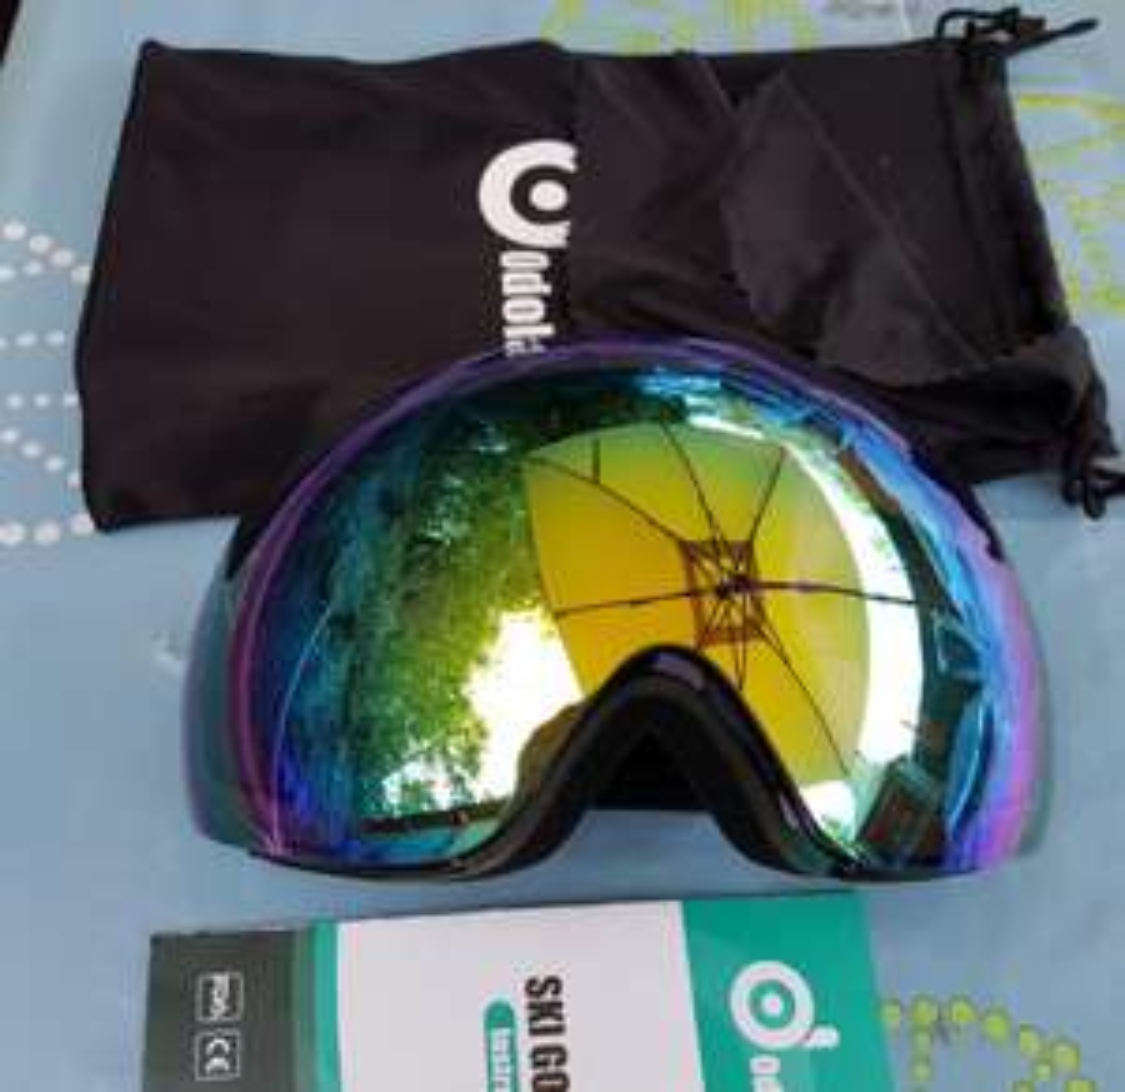 Masque de Ski sphérique Odoland (vendeur tiers)